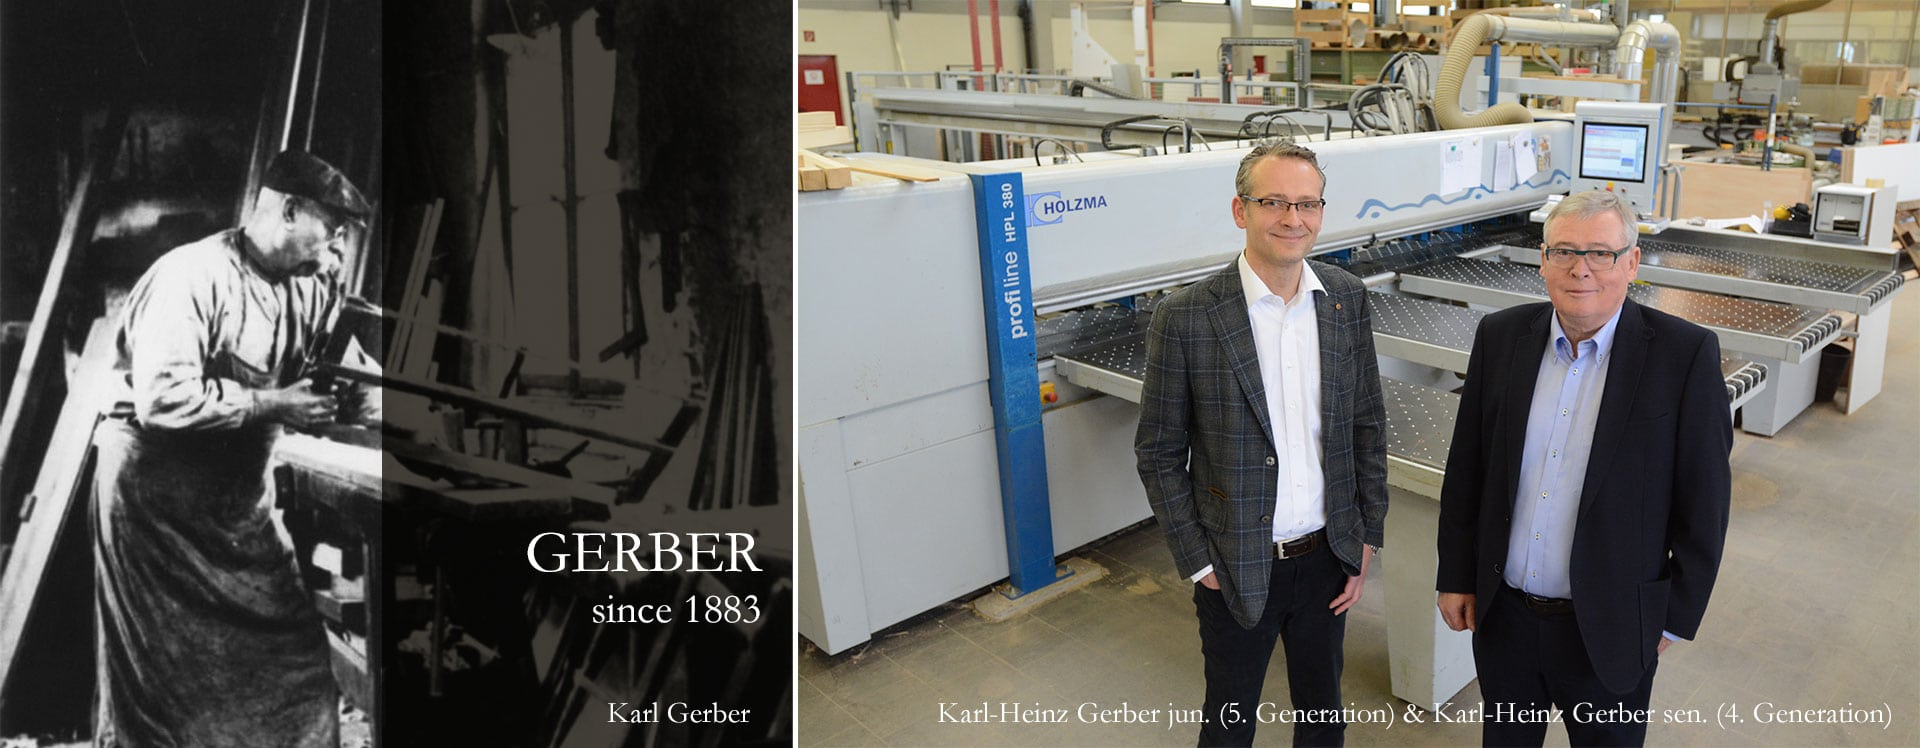 Familienunternehmen » GERBER Humidor